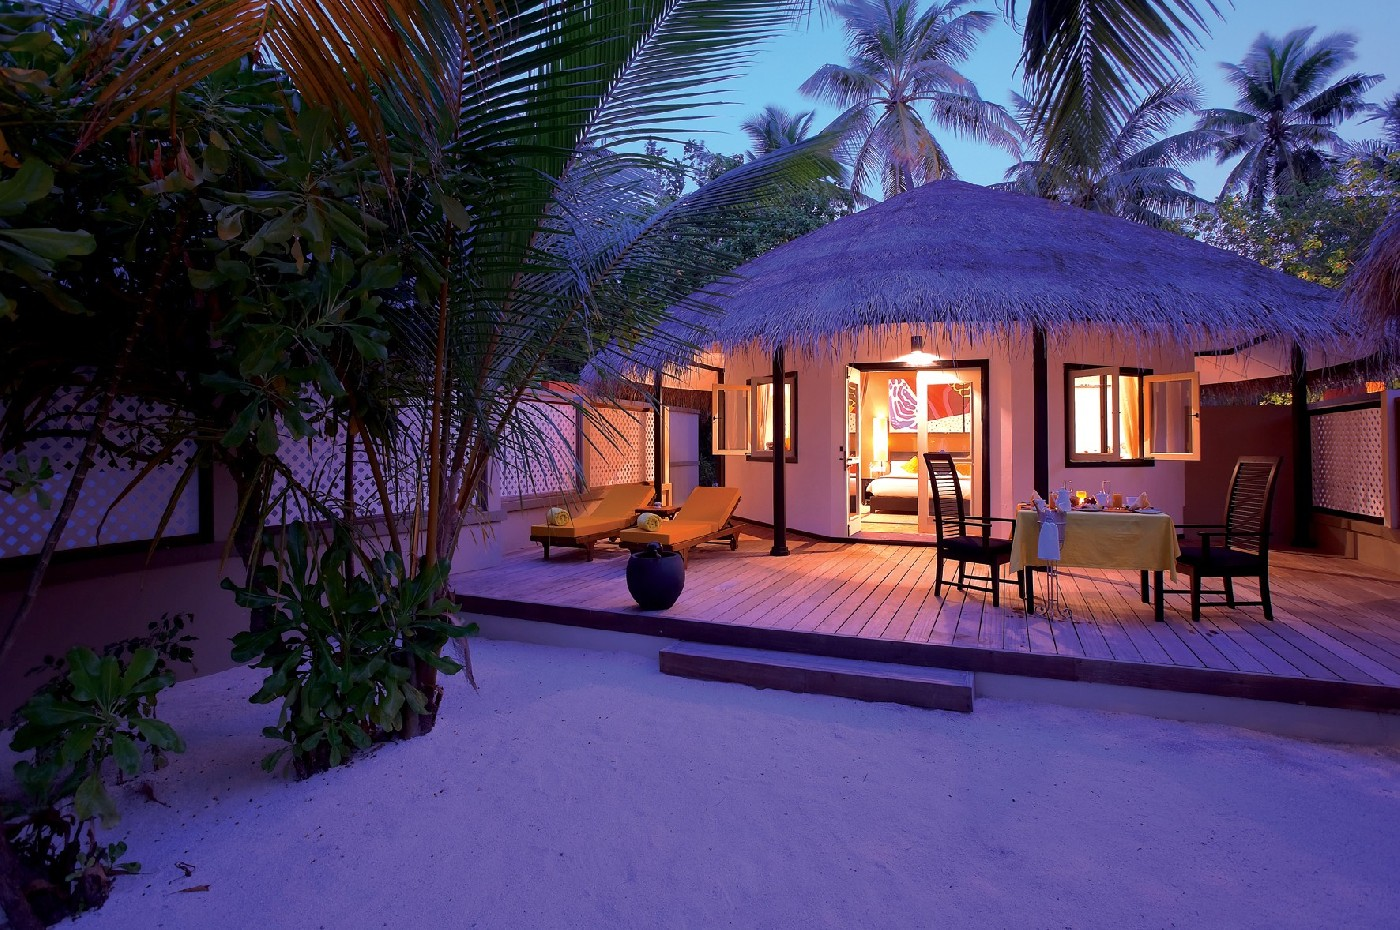 Angsana Resort & Spa Maldives Velavaru Bilder | Bild 1